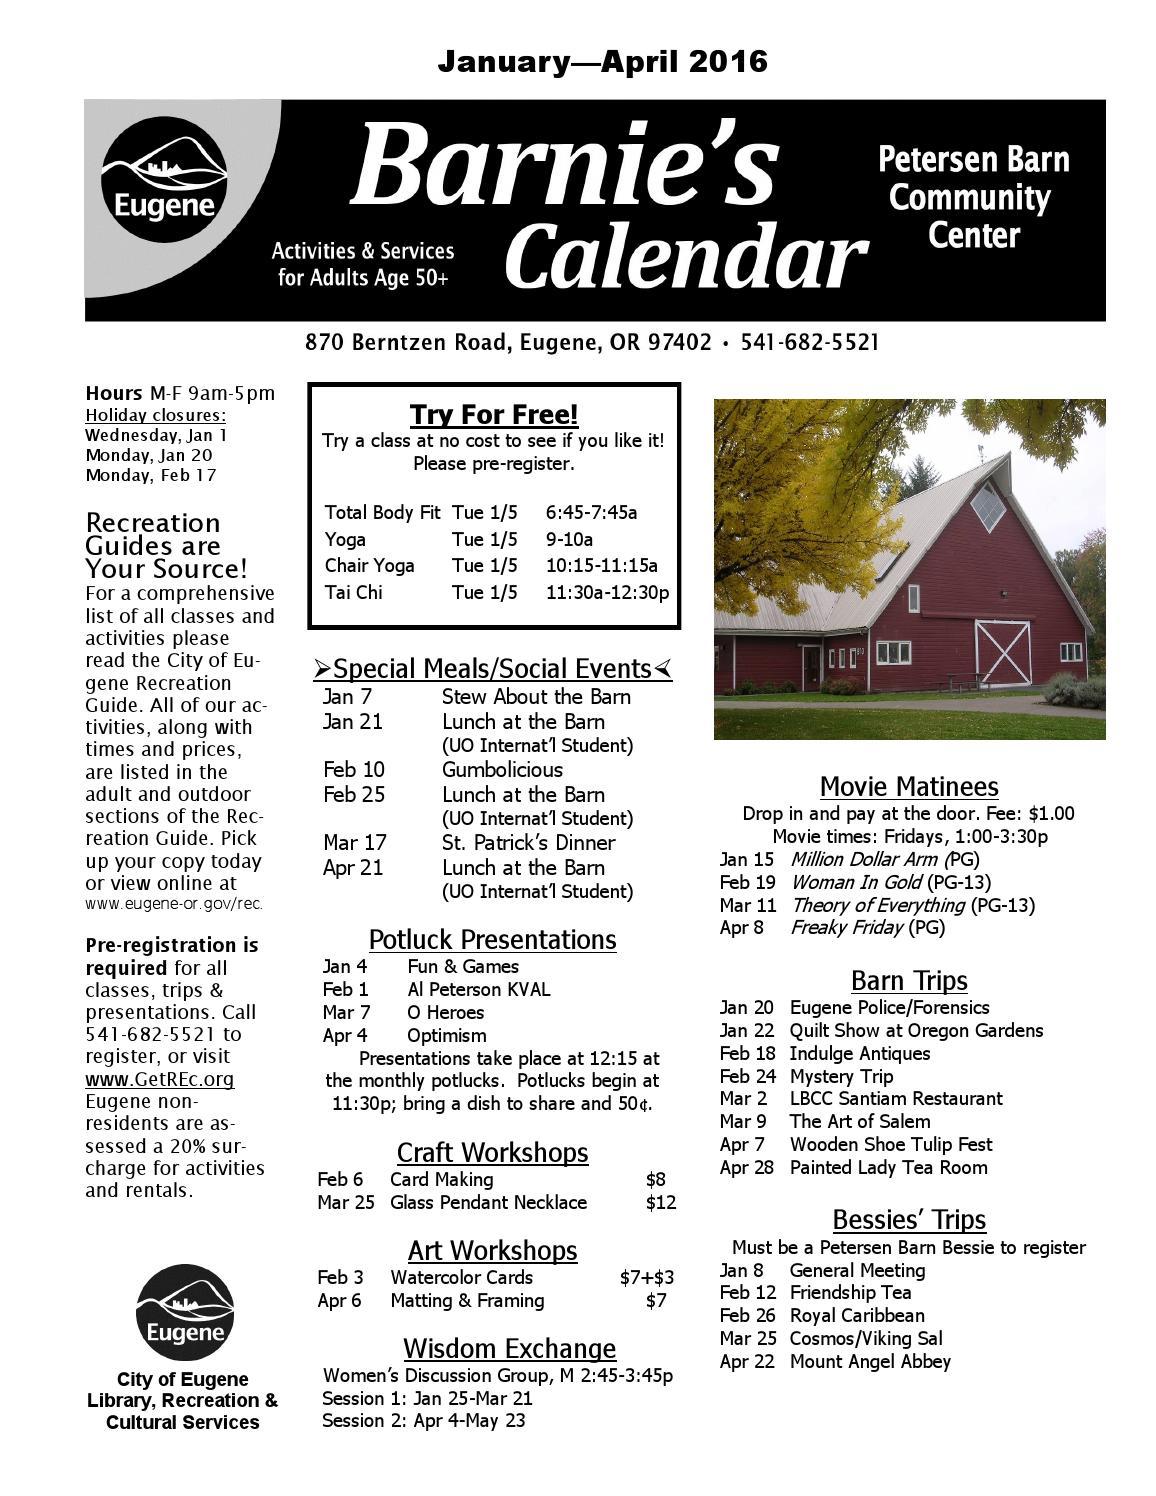 Barnies Calendar Winter/Spring 2016 by City of Eugene - issuu